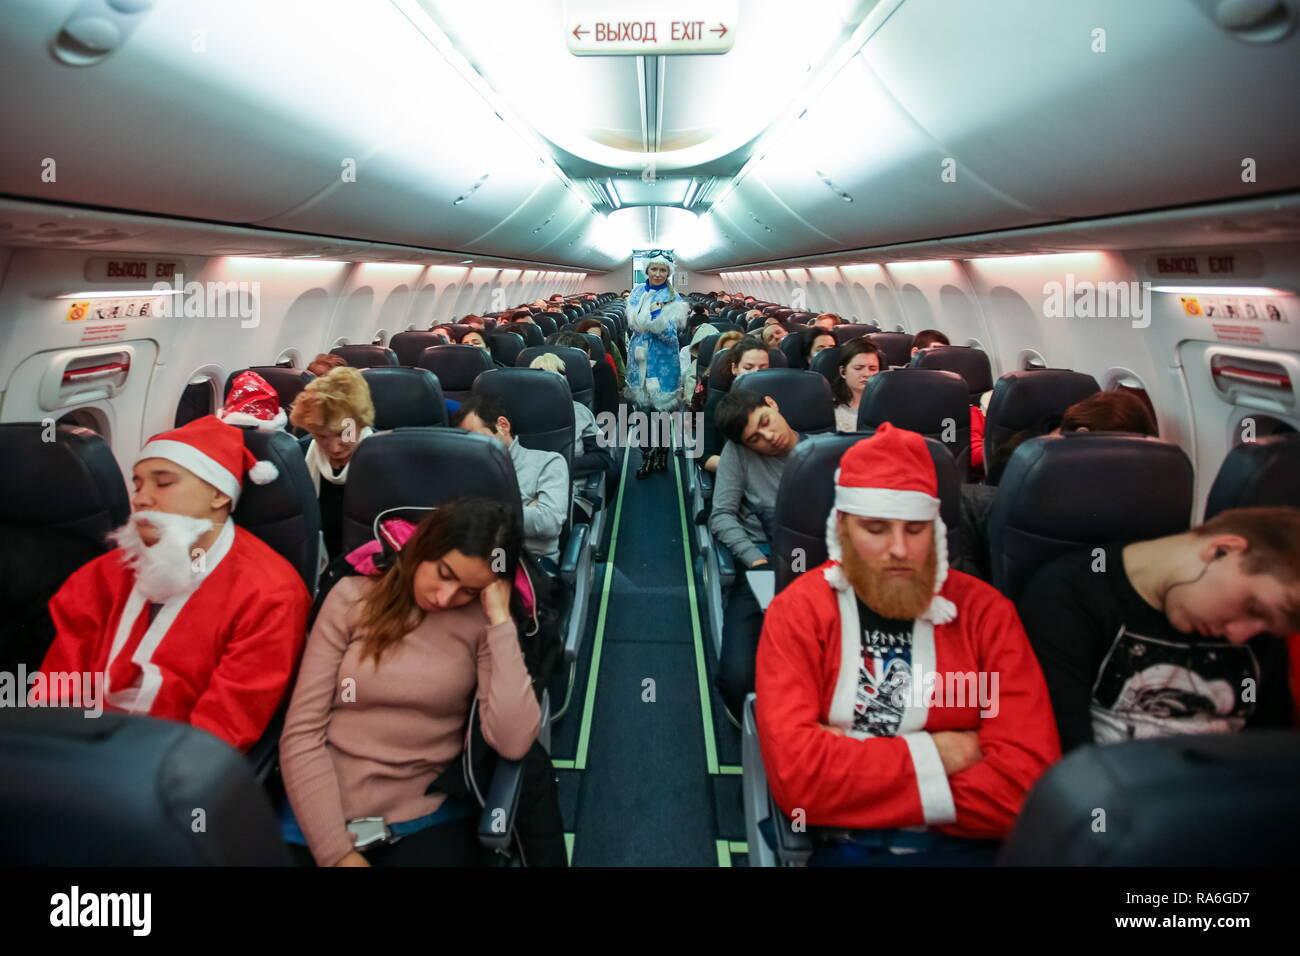 Märchen Weihnachten 2019.Russland 02 Jan 2019 Moskau Russland Januar 2 2019 Männer